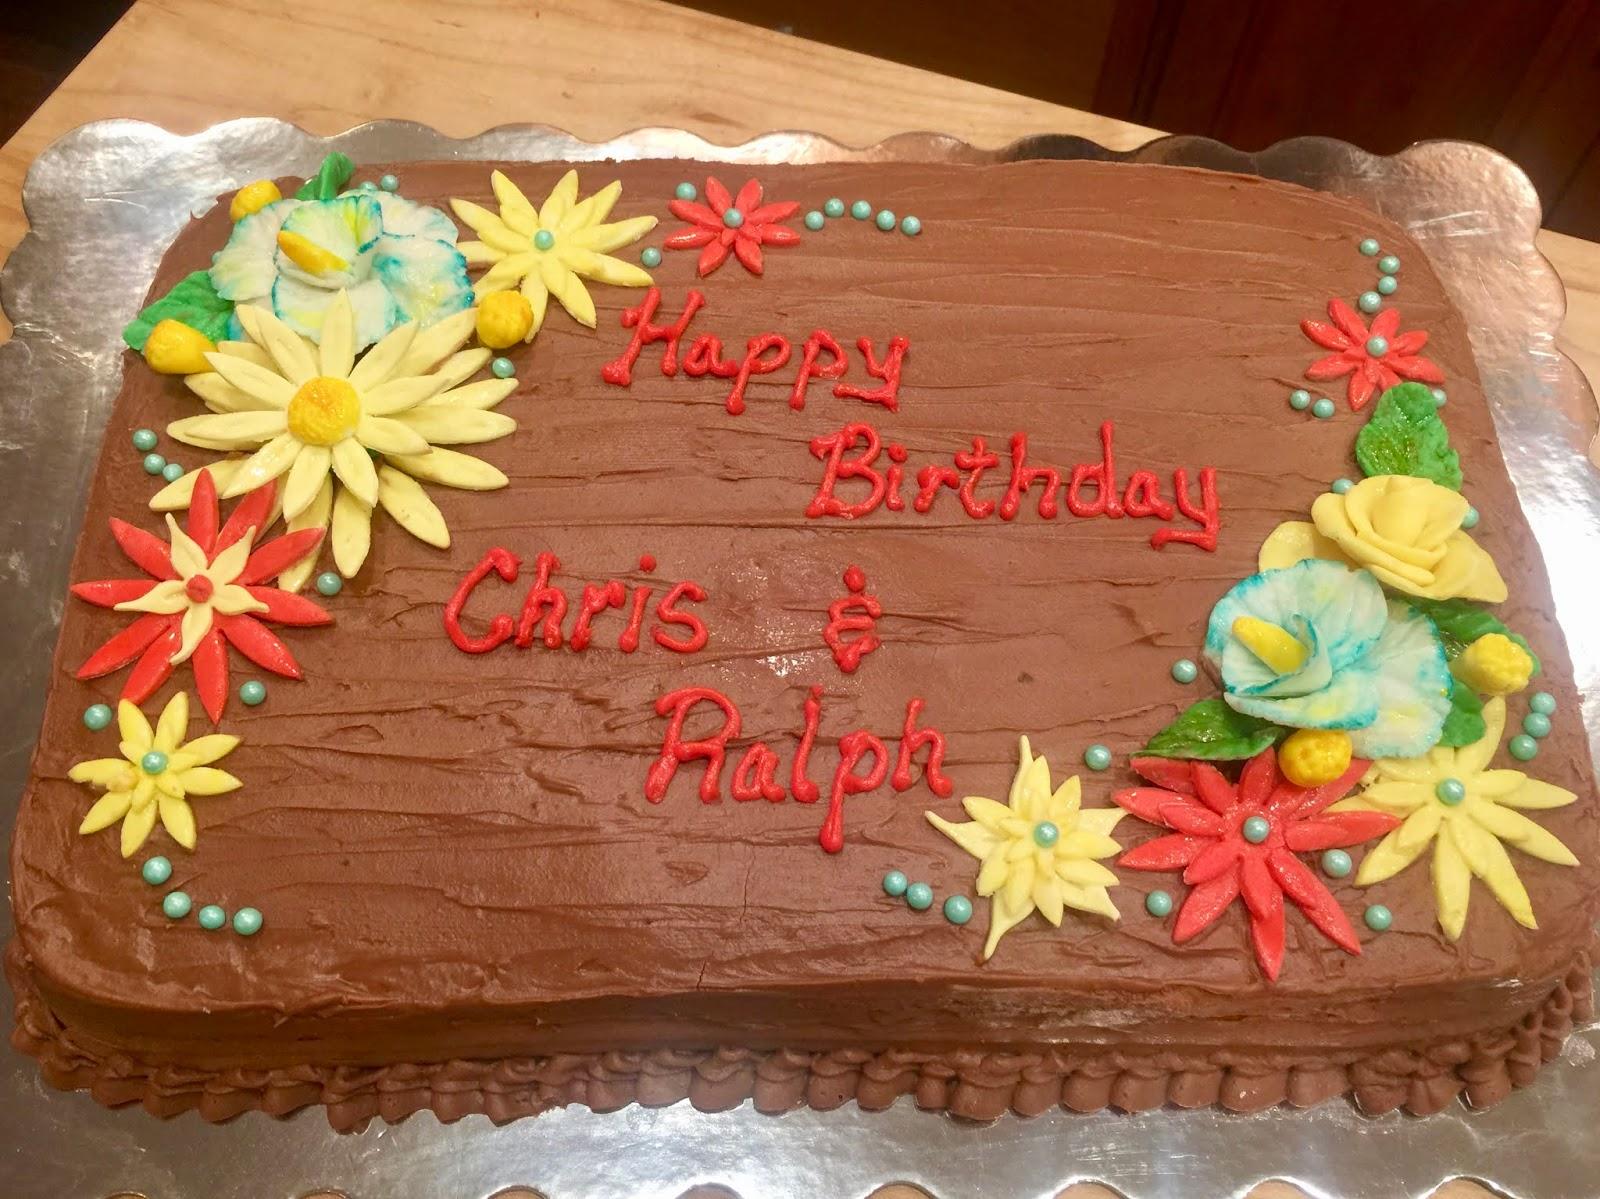 HAPPY BIRTHDAY BOYS CHOCOLATE BUTTERCREAM FROSTING AND CAKE FONDANT FLOWERS